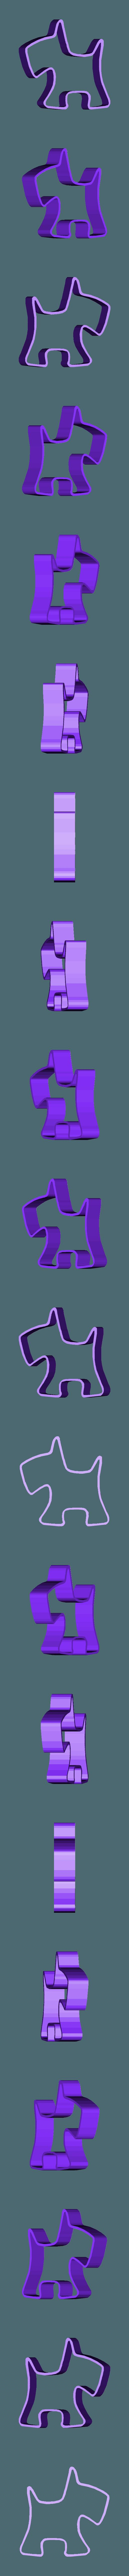 Perro.stl Download free STL file Cake and Biscuit Moulds • 3D printer design, Zero13